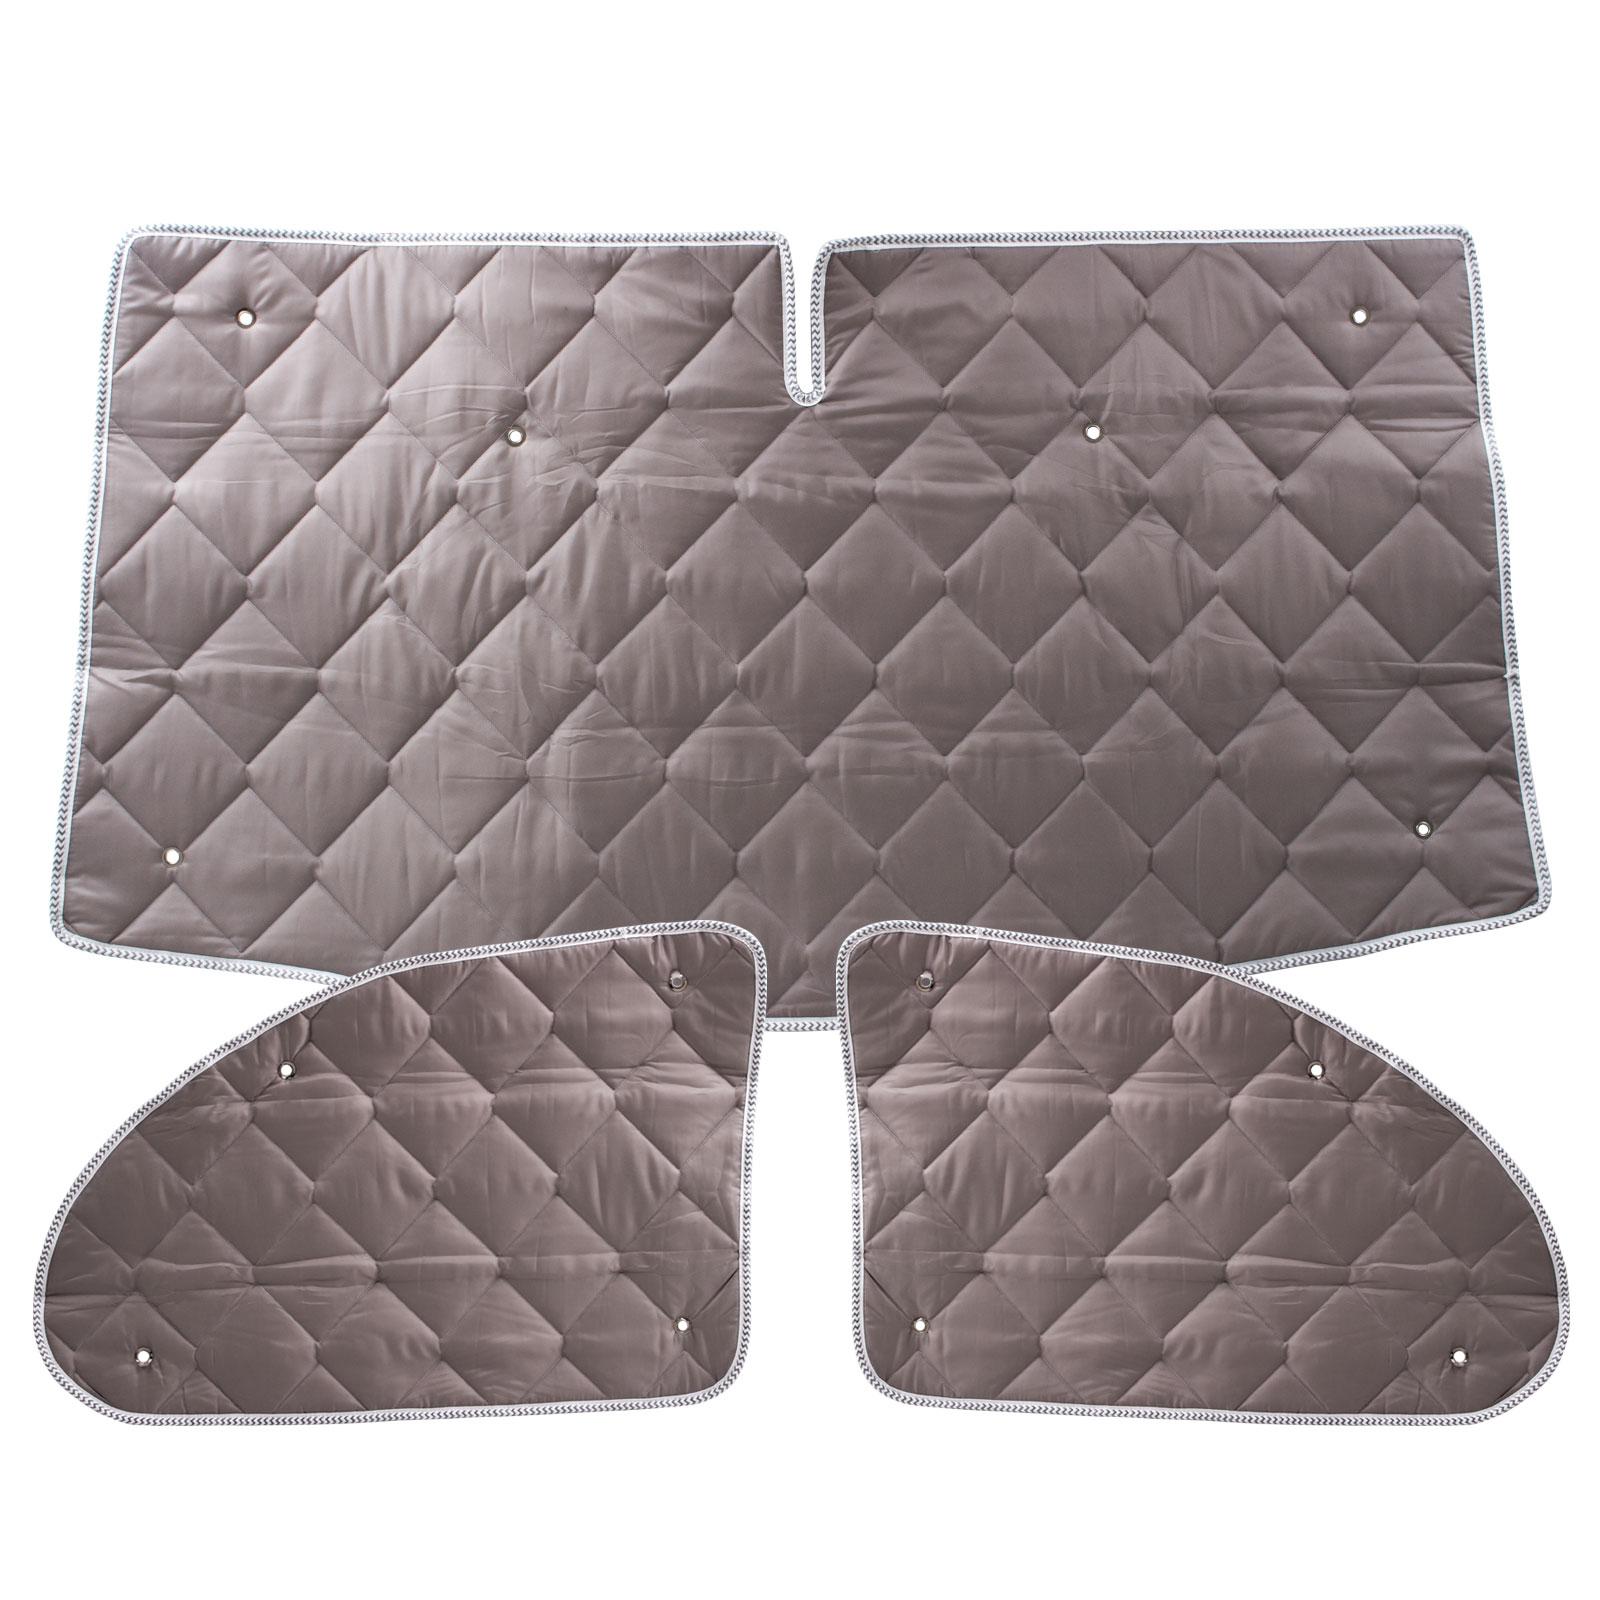 isoflex fahrerhaus thermomatte sichtschutz f r vw t4 alle ab ebay. Black Bedroom Furniture Sets. Home Design Ideas